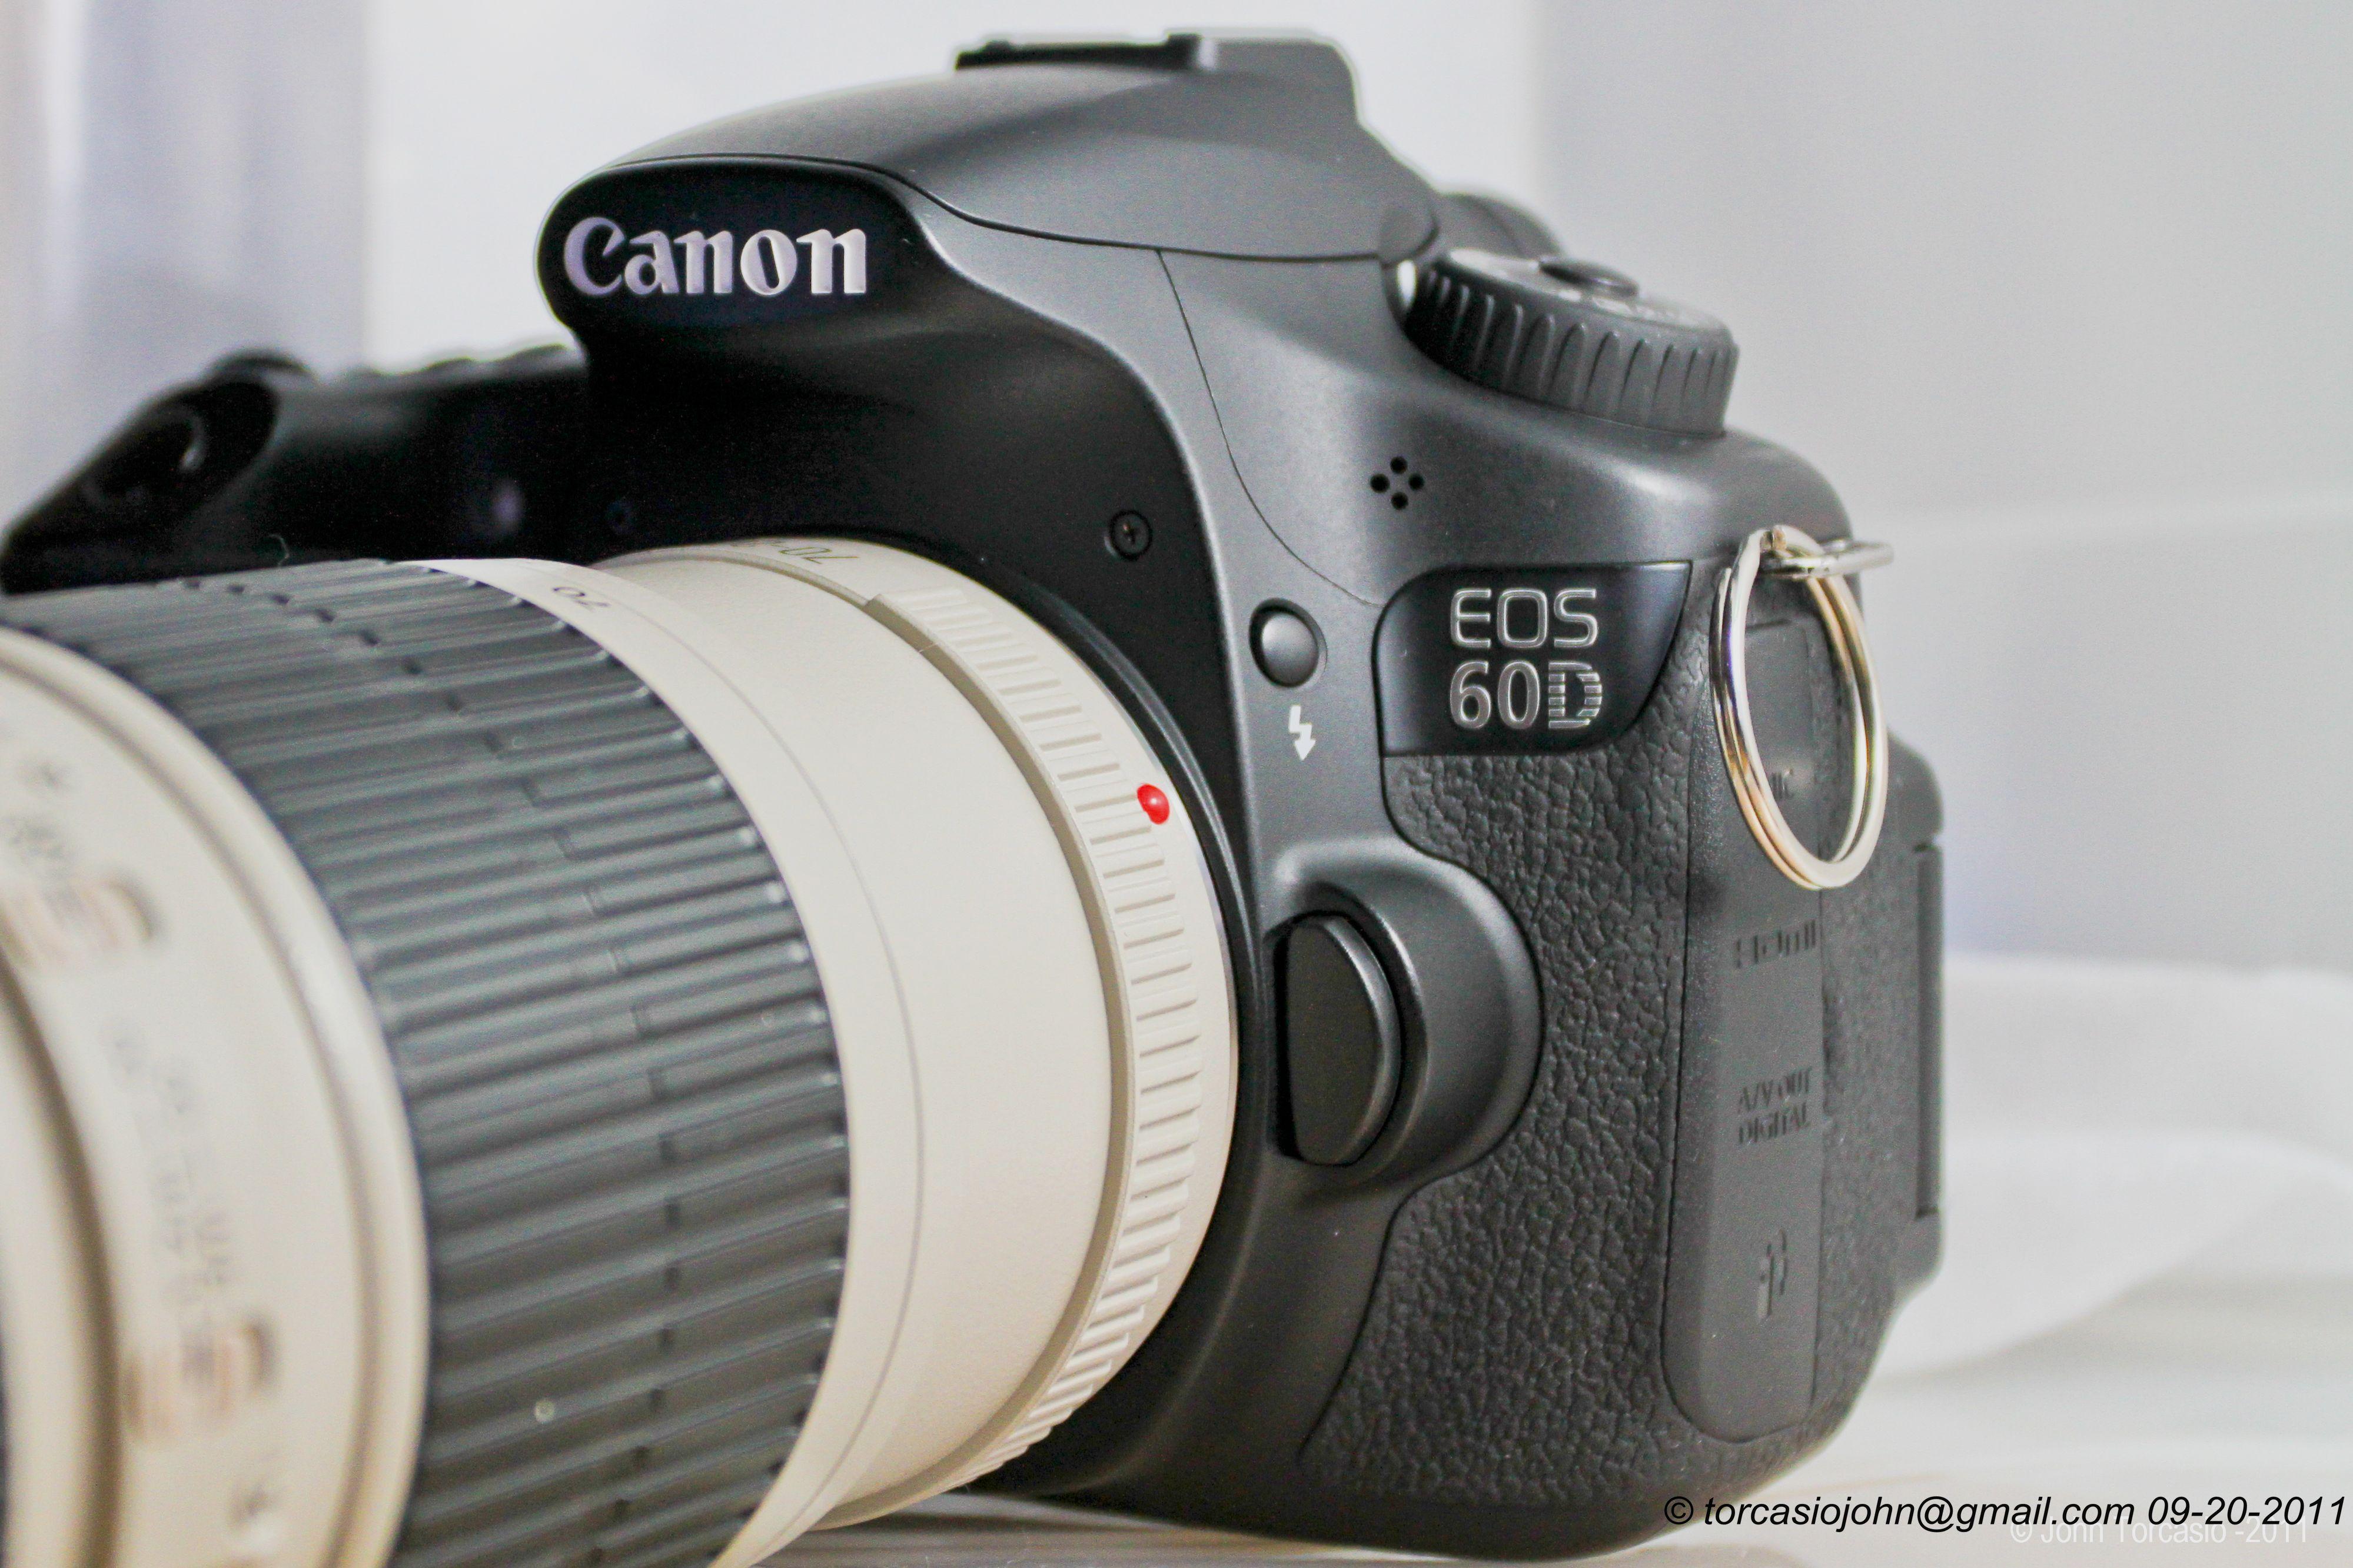 canon eos 60d camerapedia. Black Bedroom Furniture Sets. Home Design Ideas